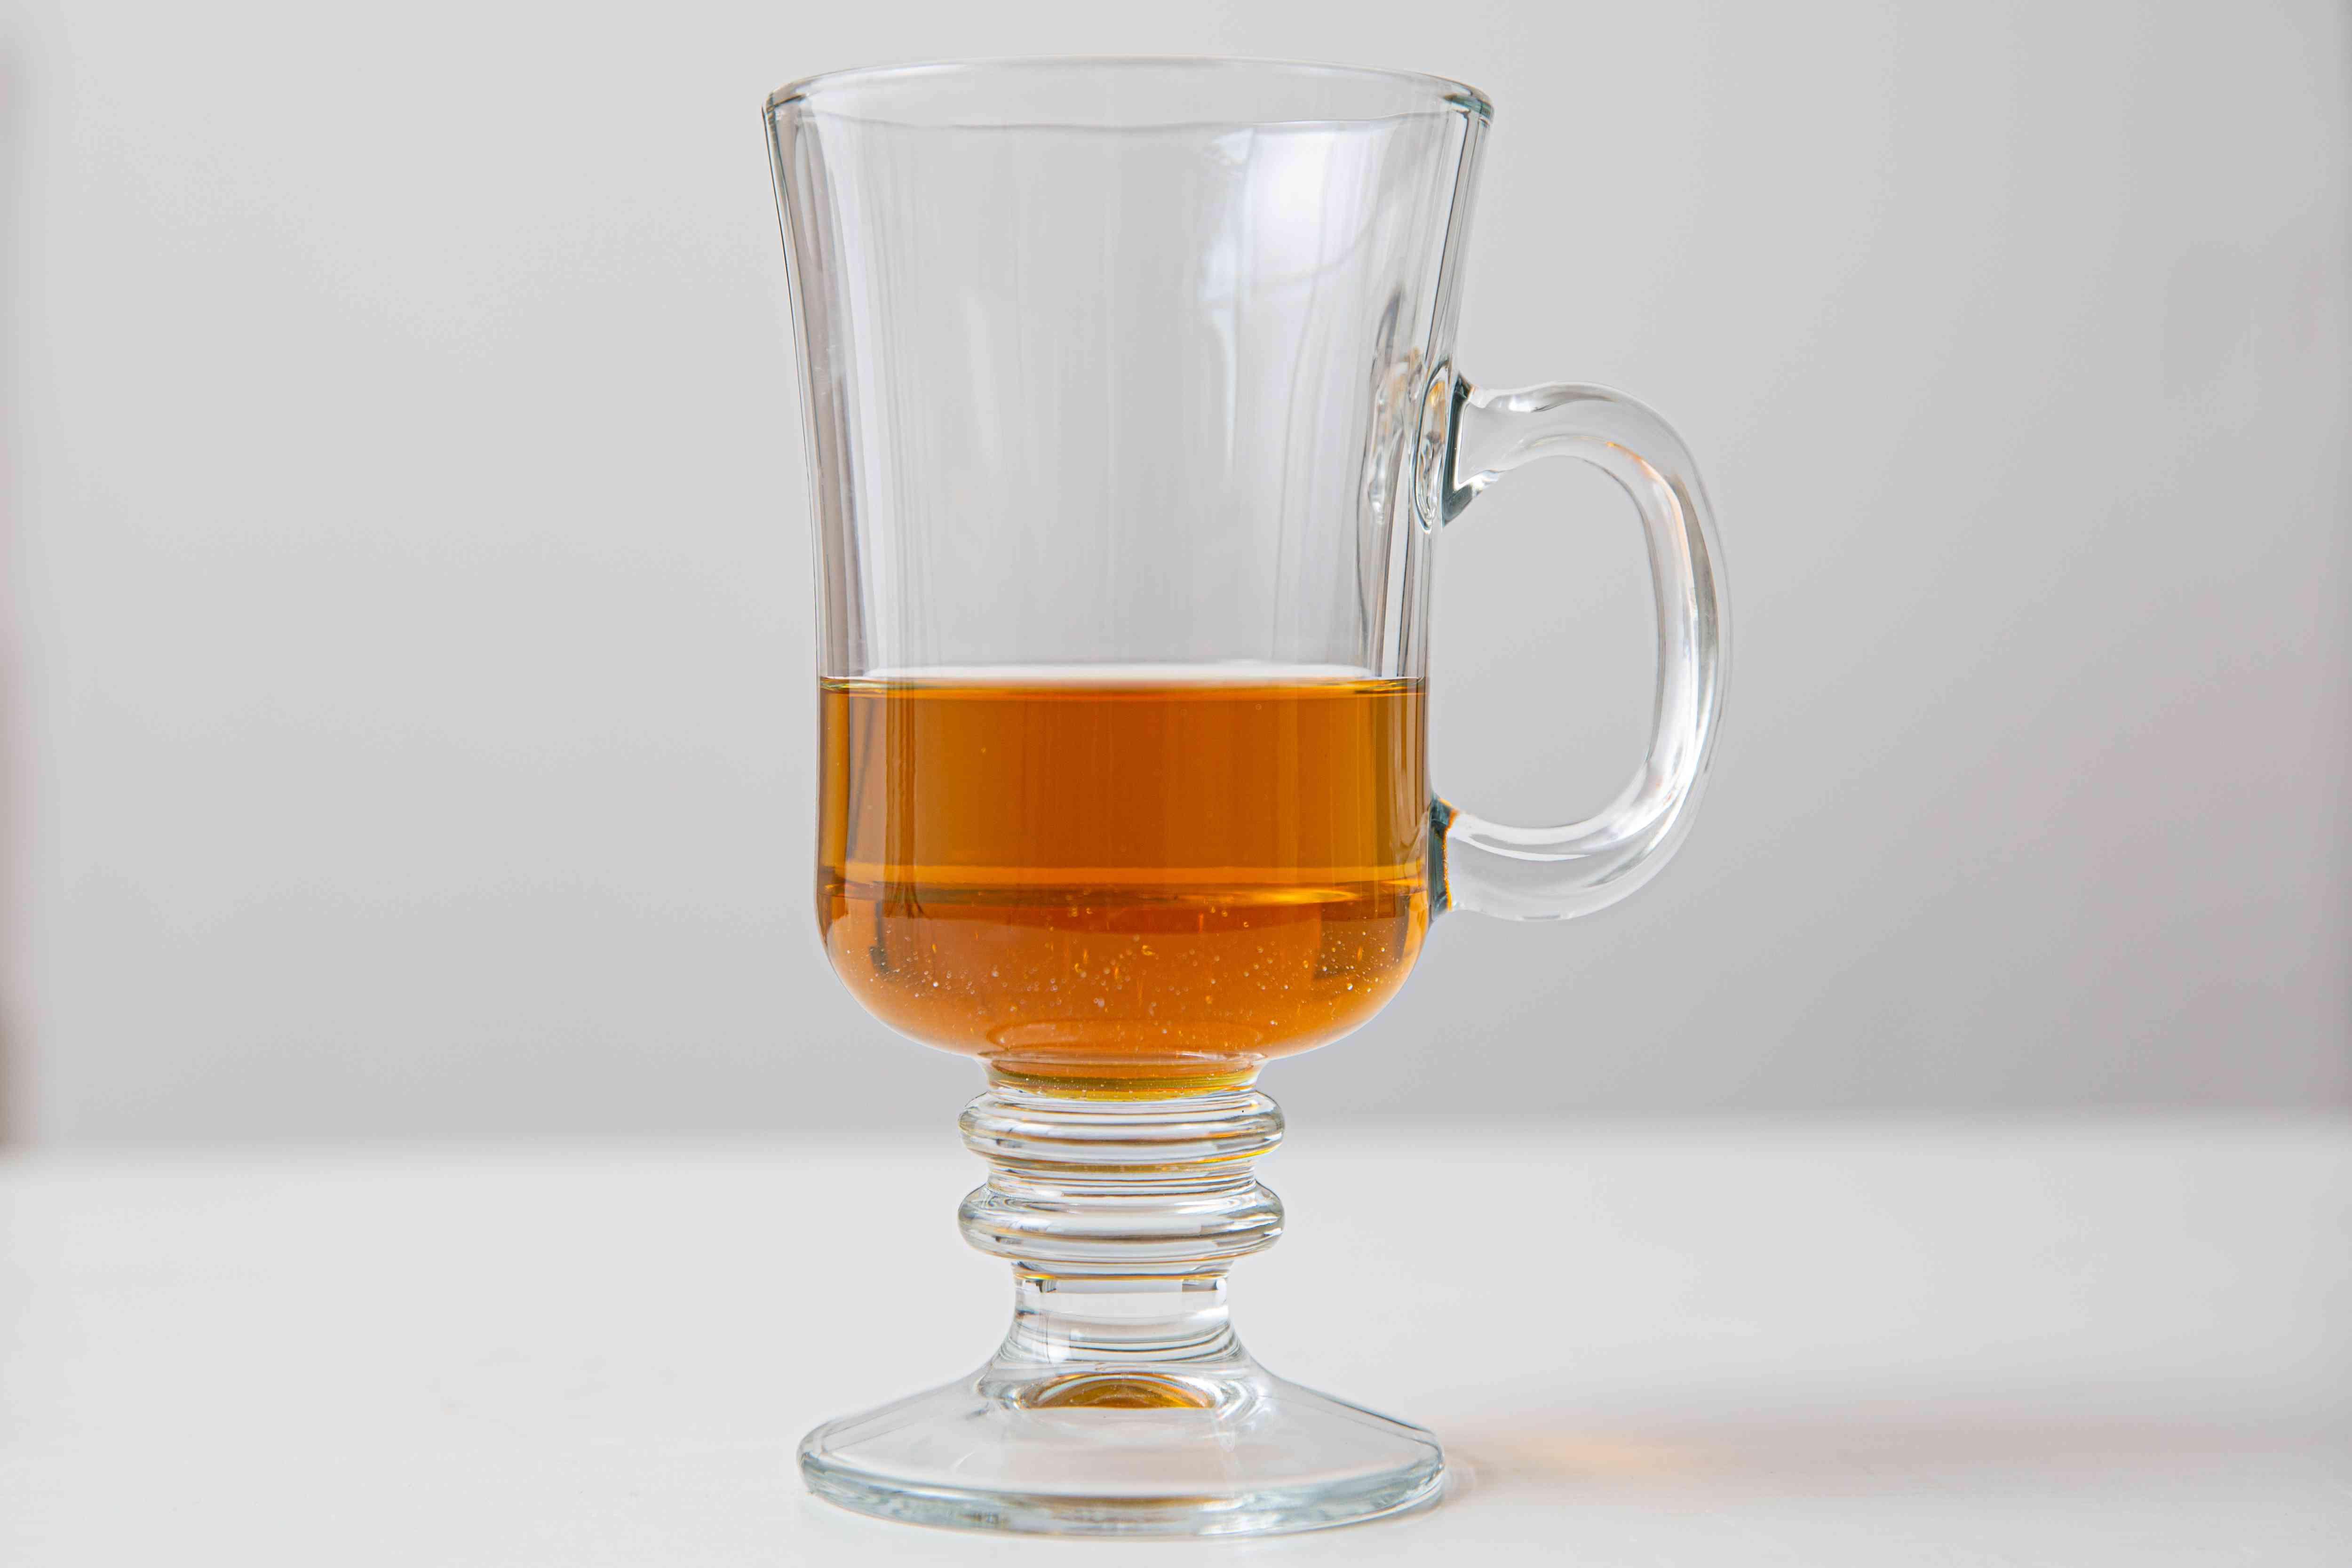 Honey and whiskey in an Irish coffee glass